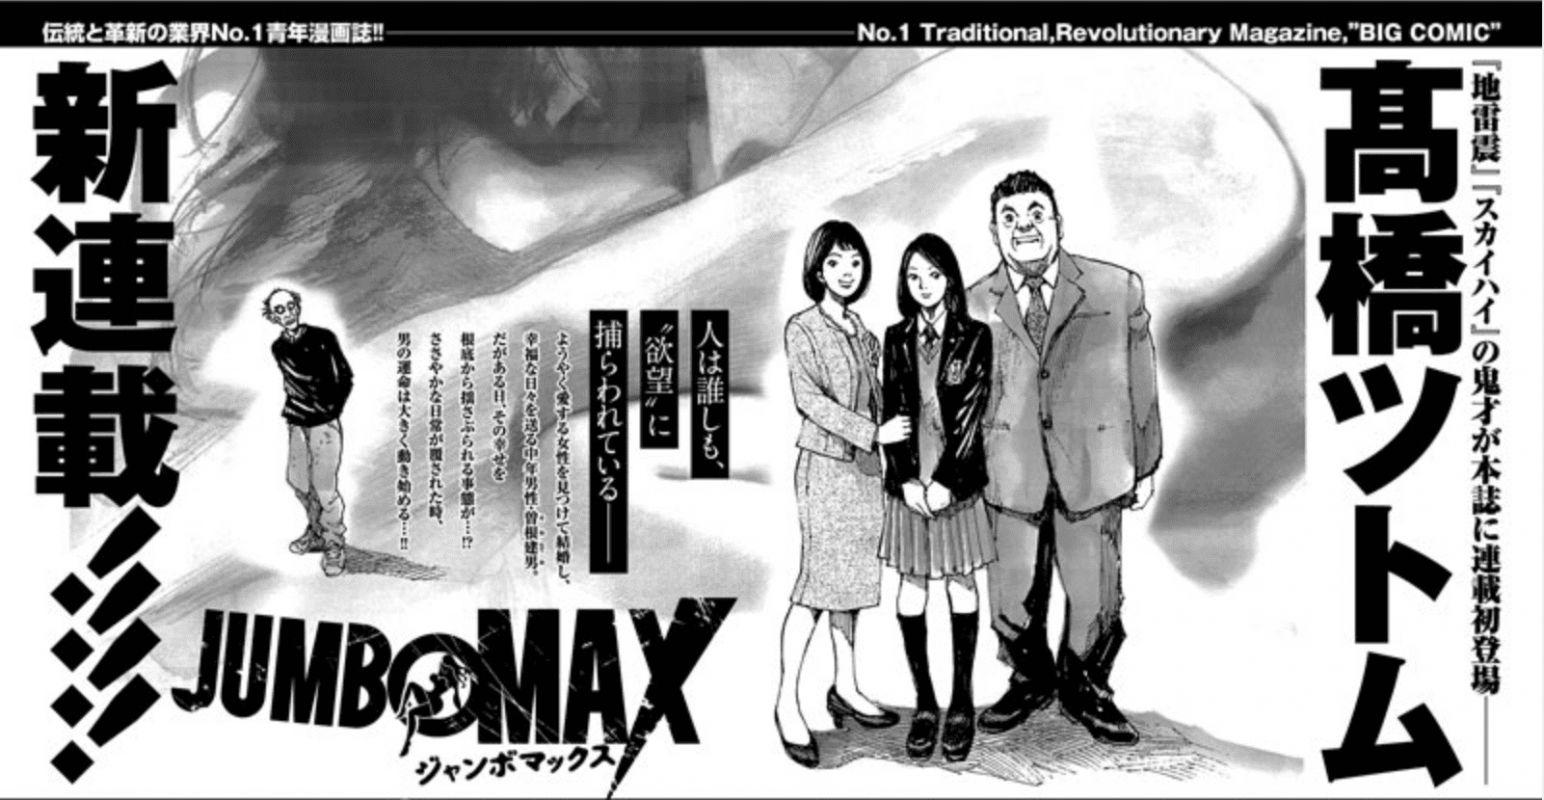 Un (autre) nouveau manga pour Tsutomu Takahashi !